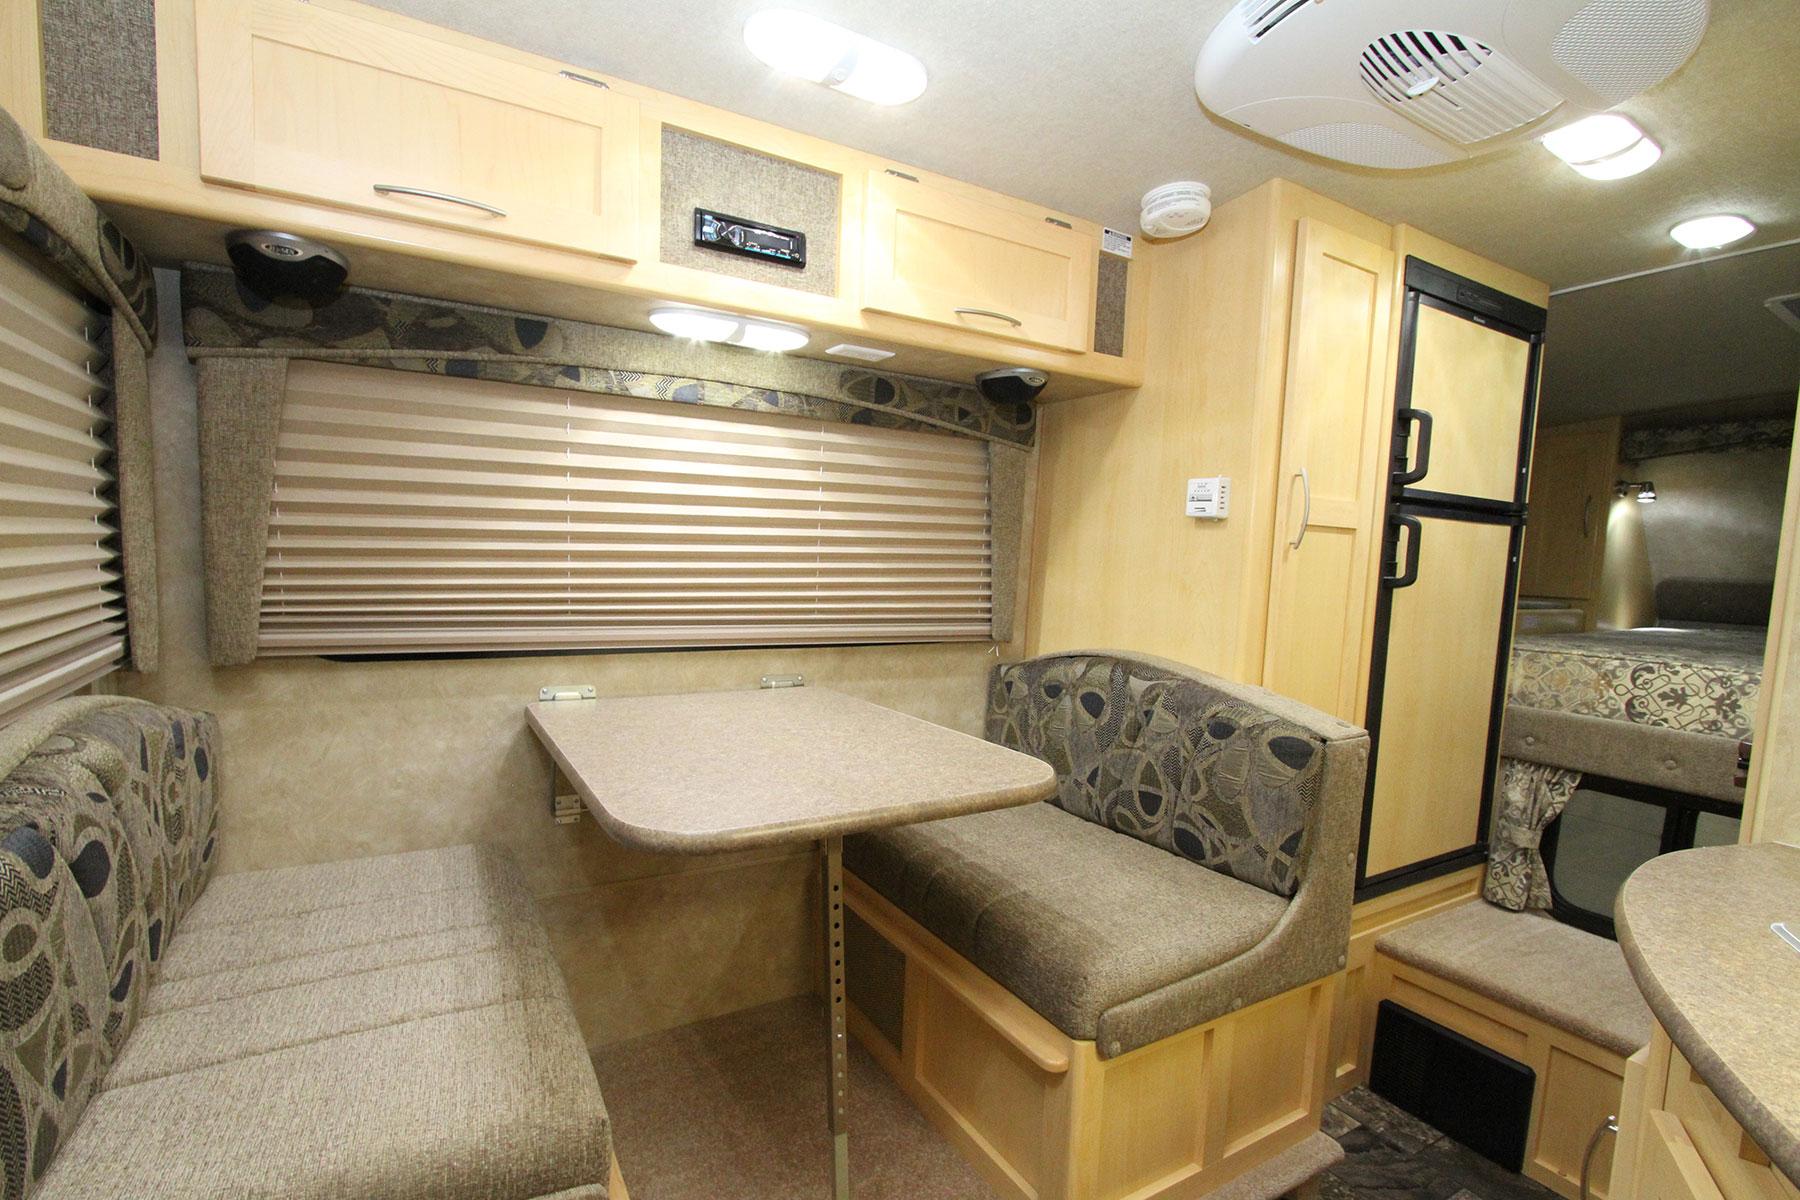 2500-Truck Camper 2500 94 - Interior View-Interior-3